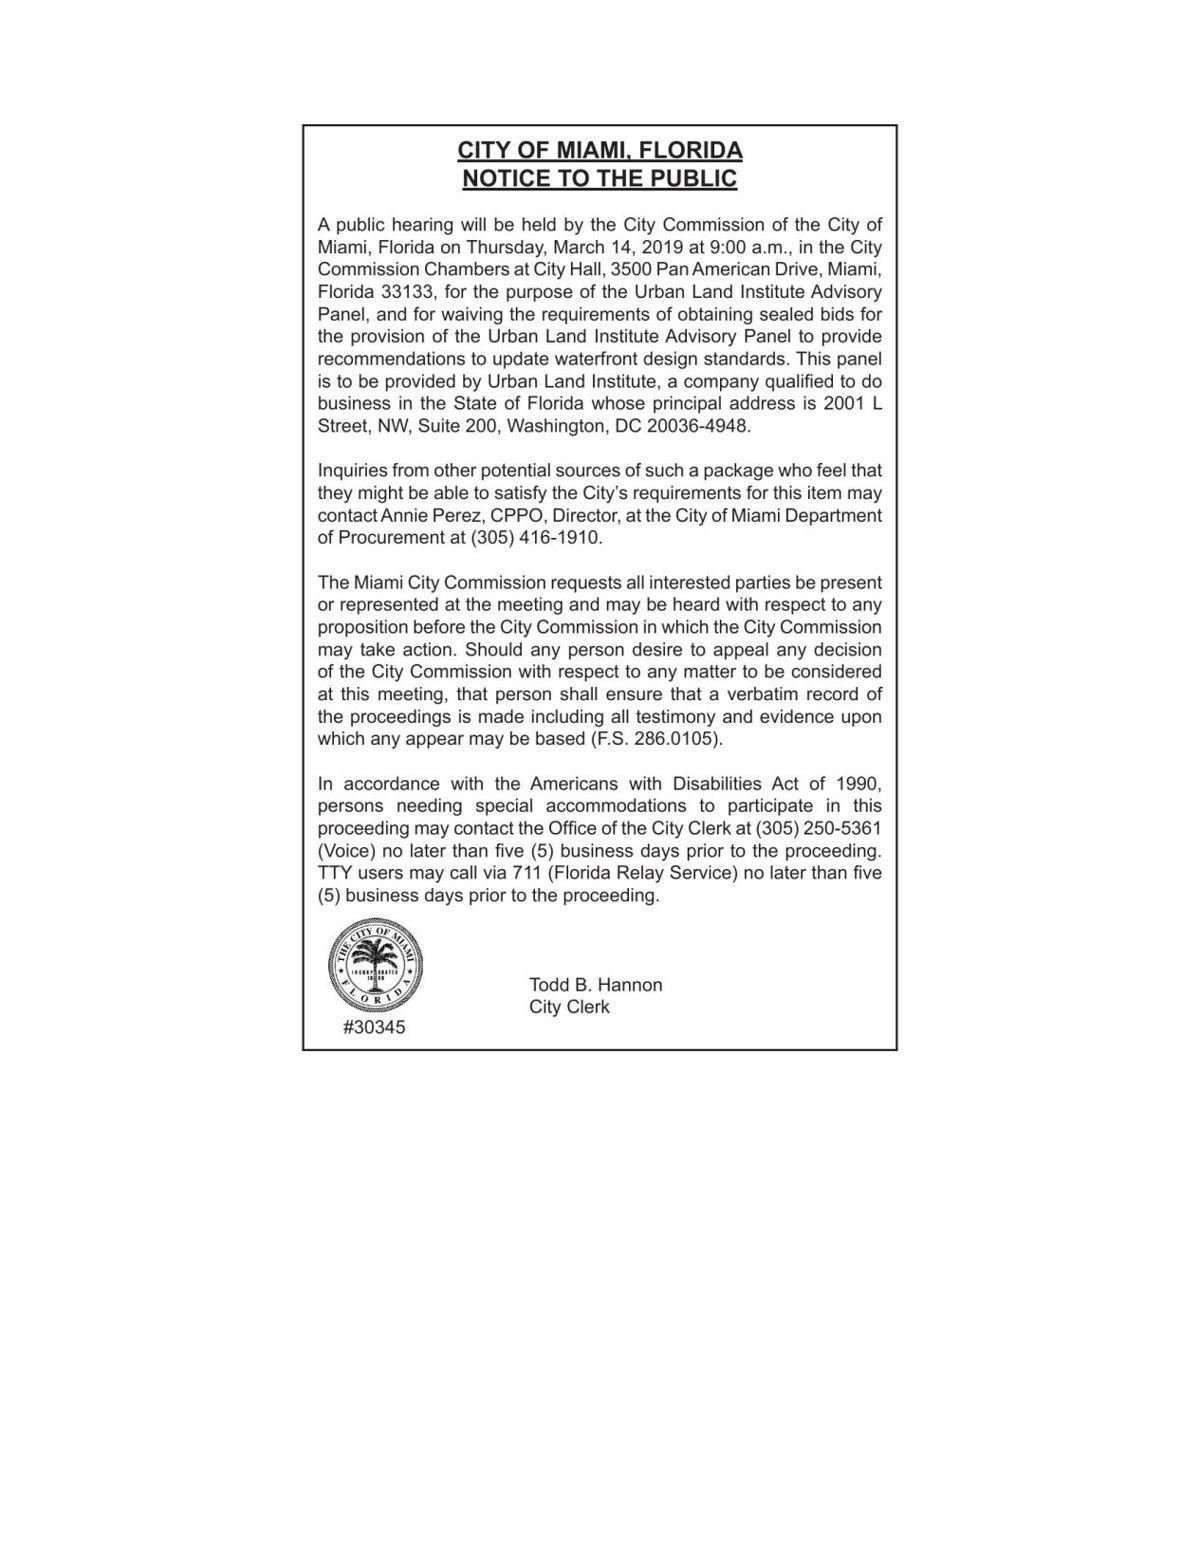 CITY OF MIAMI, FLORIDA NOTICE TO THE PUBLIC